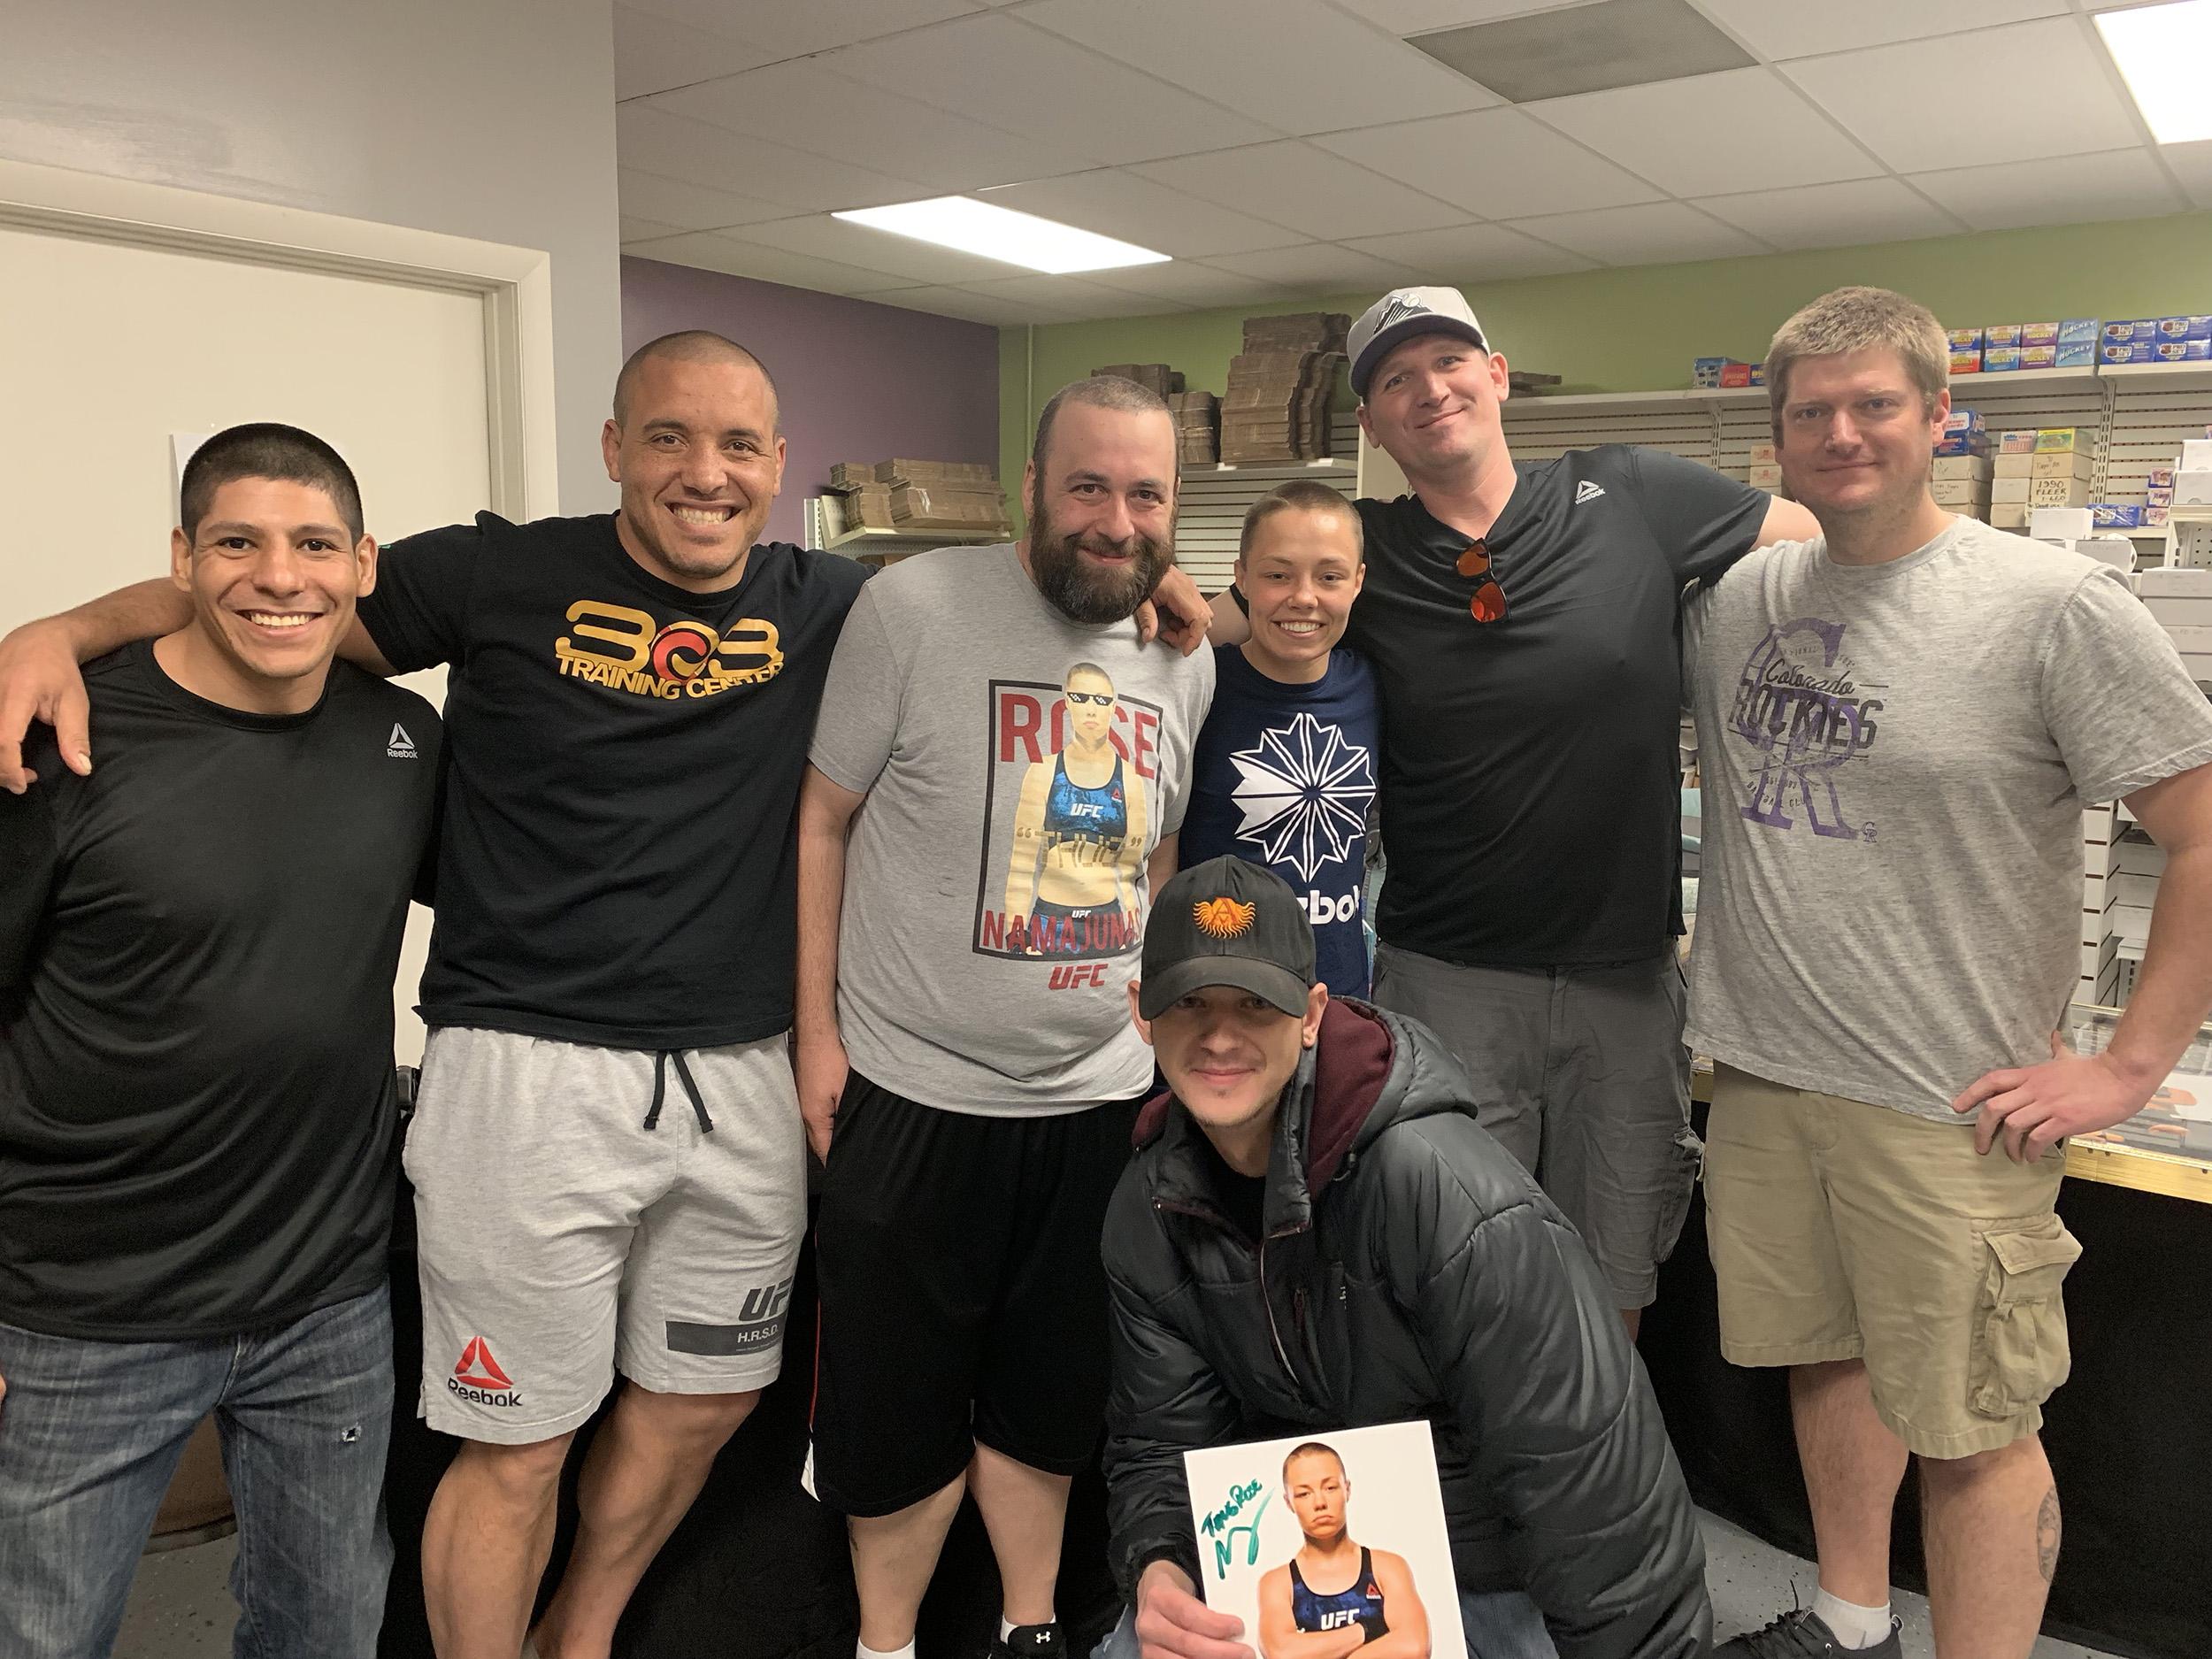 From left: Brian Lopez, Pat Barry, Jon Scanlon, Rose Namajunas, Jeremy Brady, Shawn Johnson, Adam Peterson (Front)